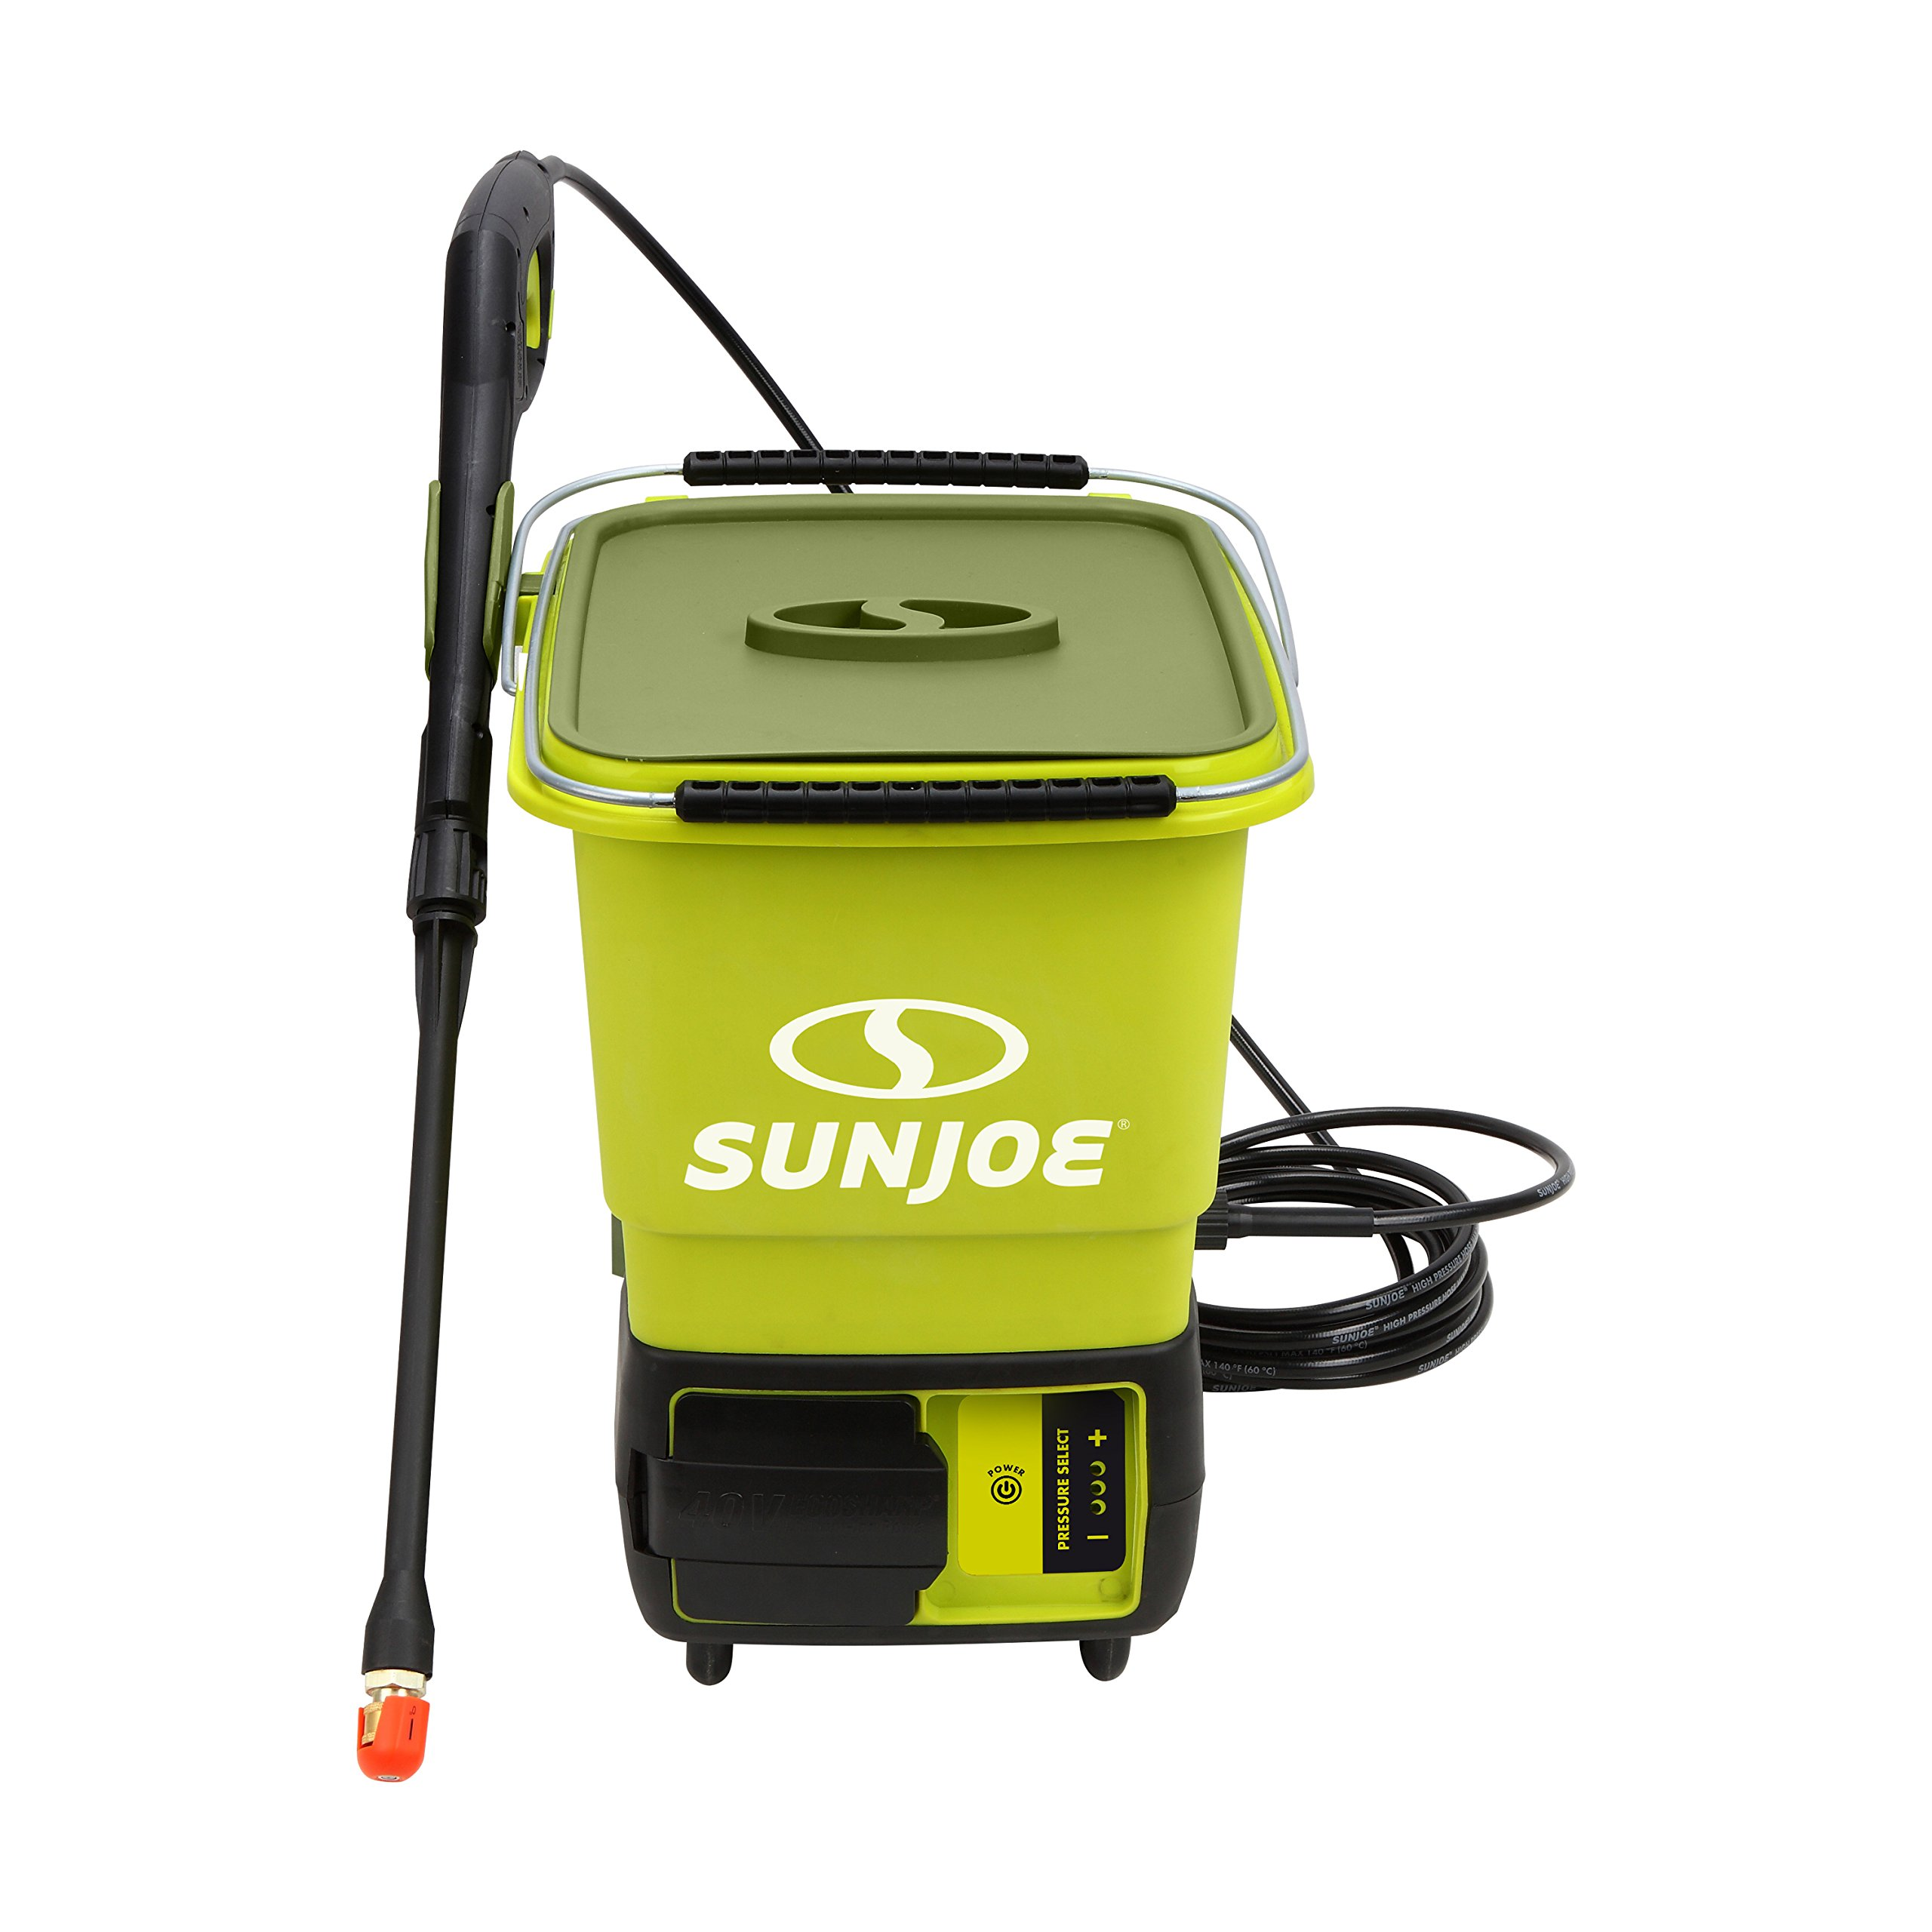 Sun Joe SPX6000C-XR iON Cordless Pressure Washer | 1160 PSI · 40V · 5.0 Ah